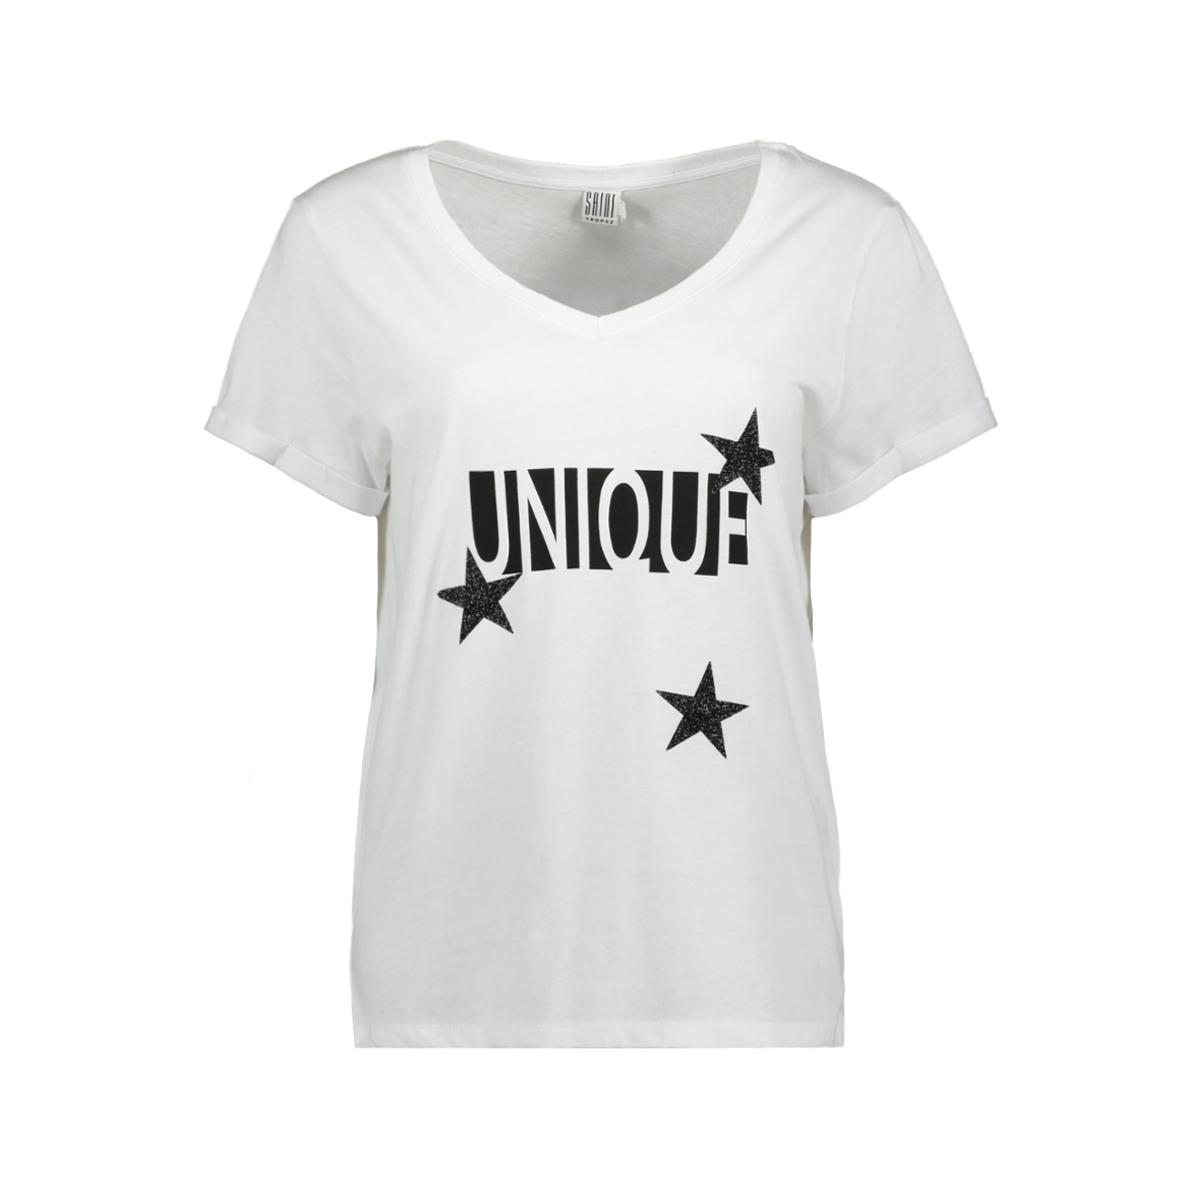 t shirt with artwork r1532 saint tropez t-shirt 1000 white